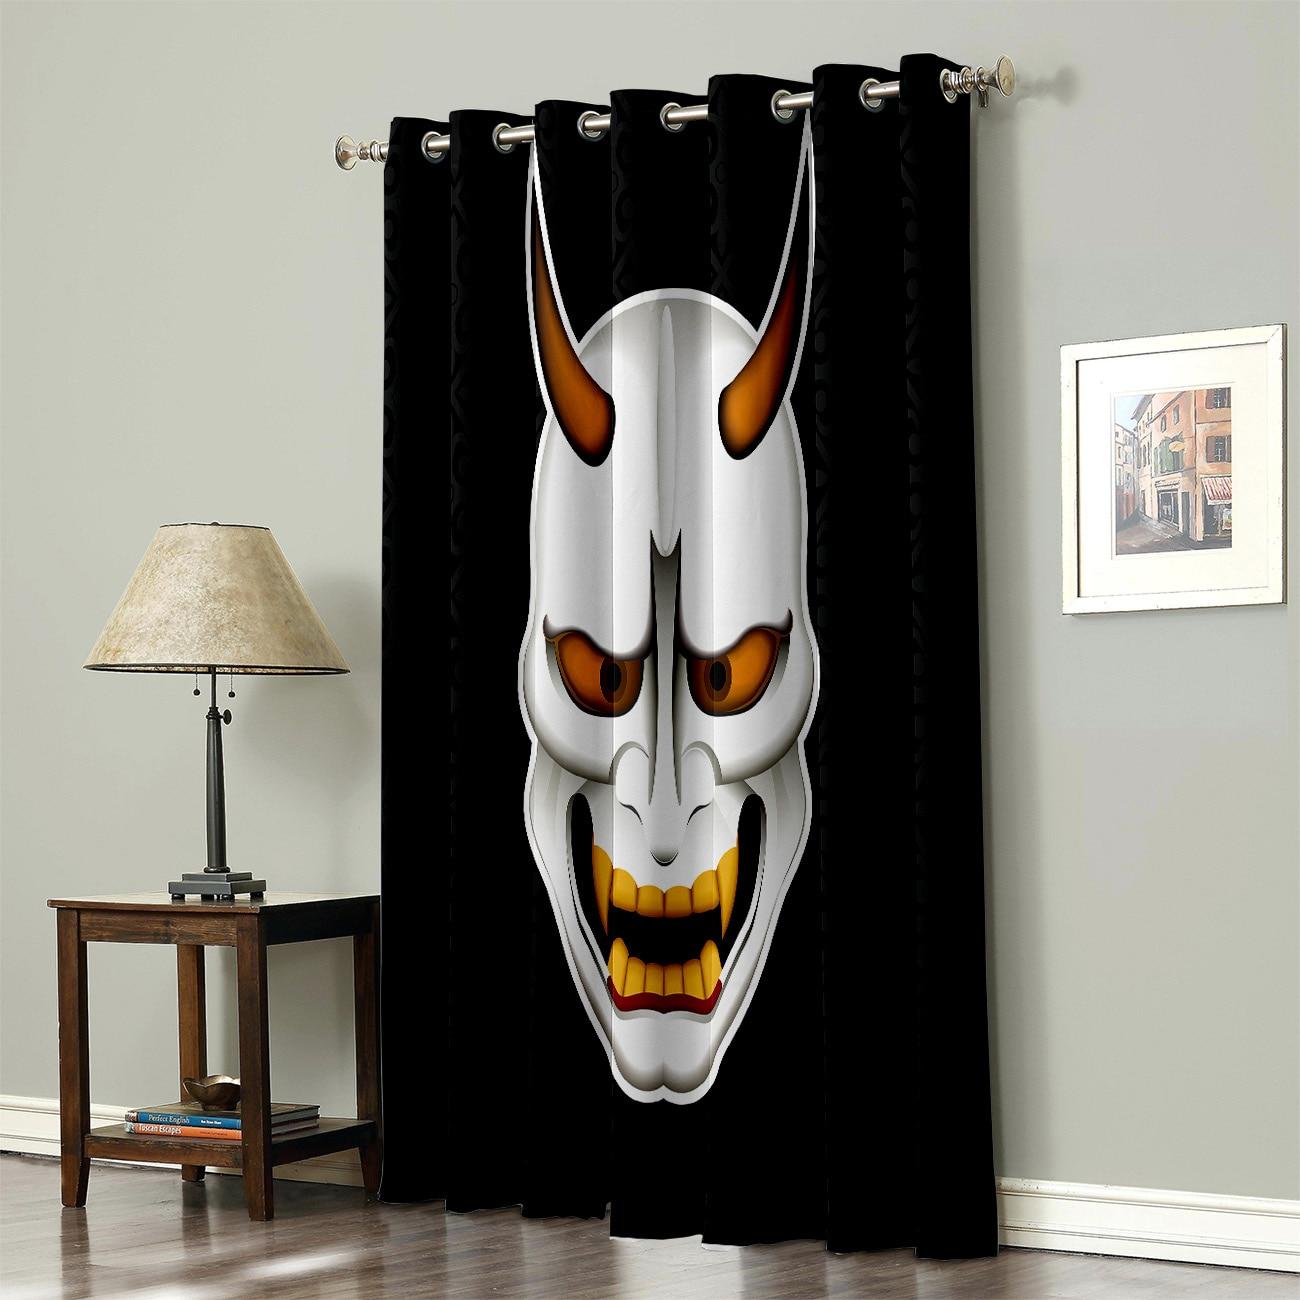 Japanese Samurai Mask Window Treatments Curtains Valance Window Curtains Dark Outdoor Bedroom Kitchen Fabric Decor Kids Curtain